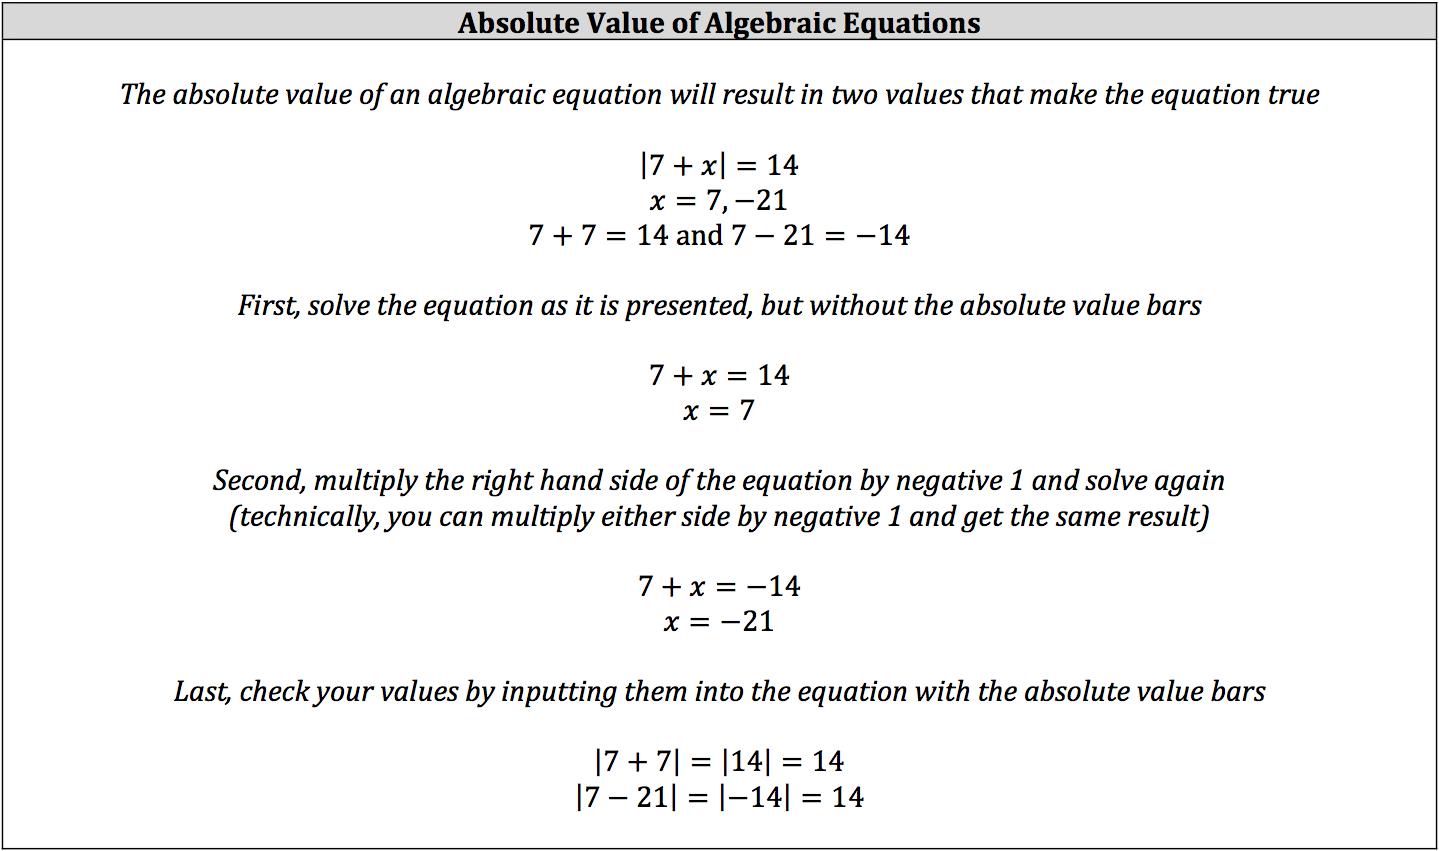 absolute-value-of-algebraic-equations